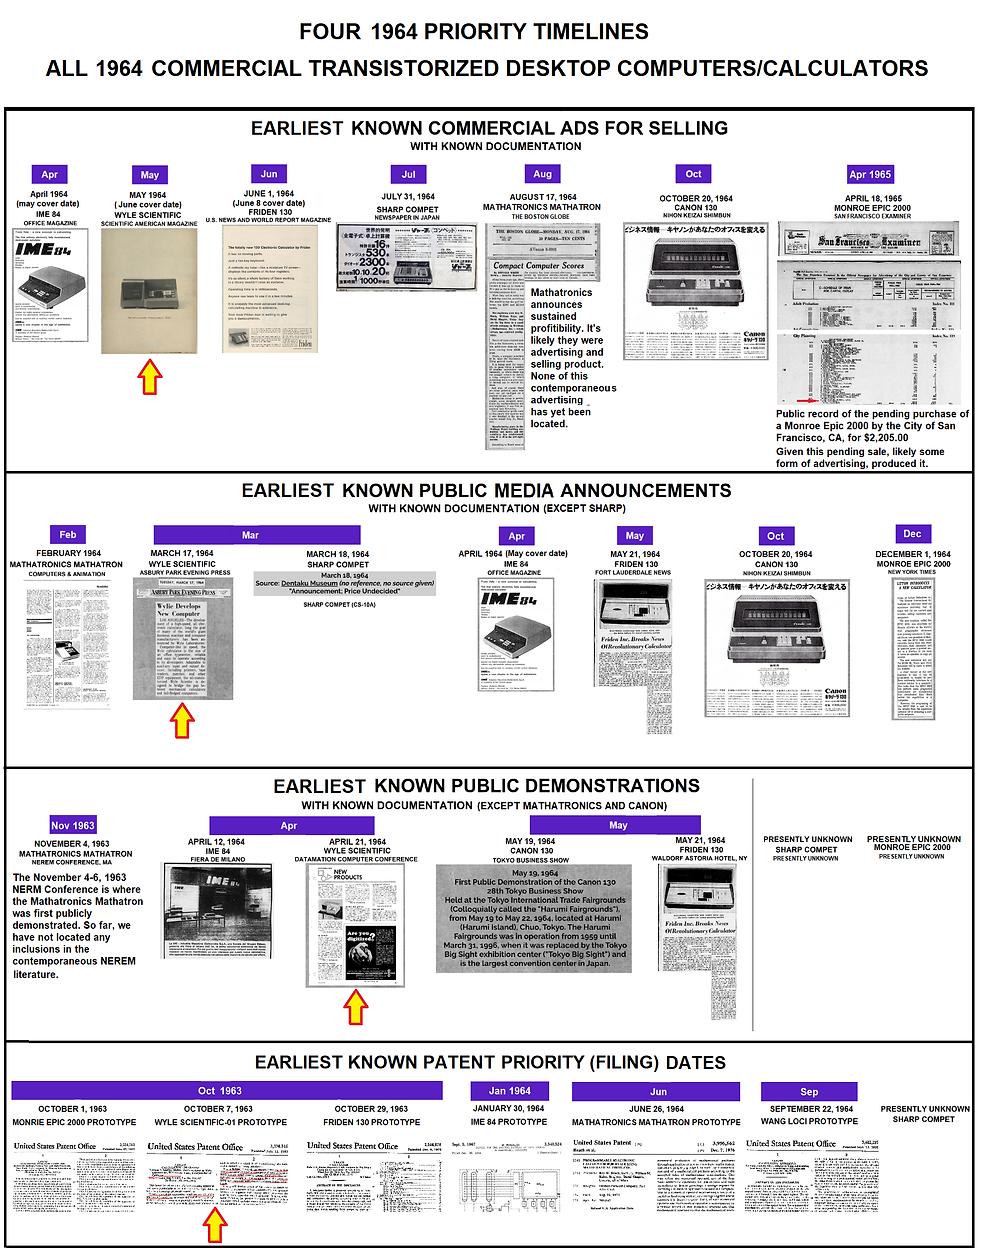 New Bitmap Image (15) - Copy - Copy - Copy - Copy - Copy (1) - Copy.png